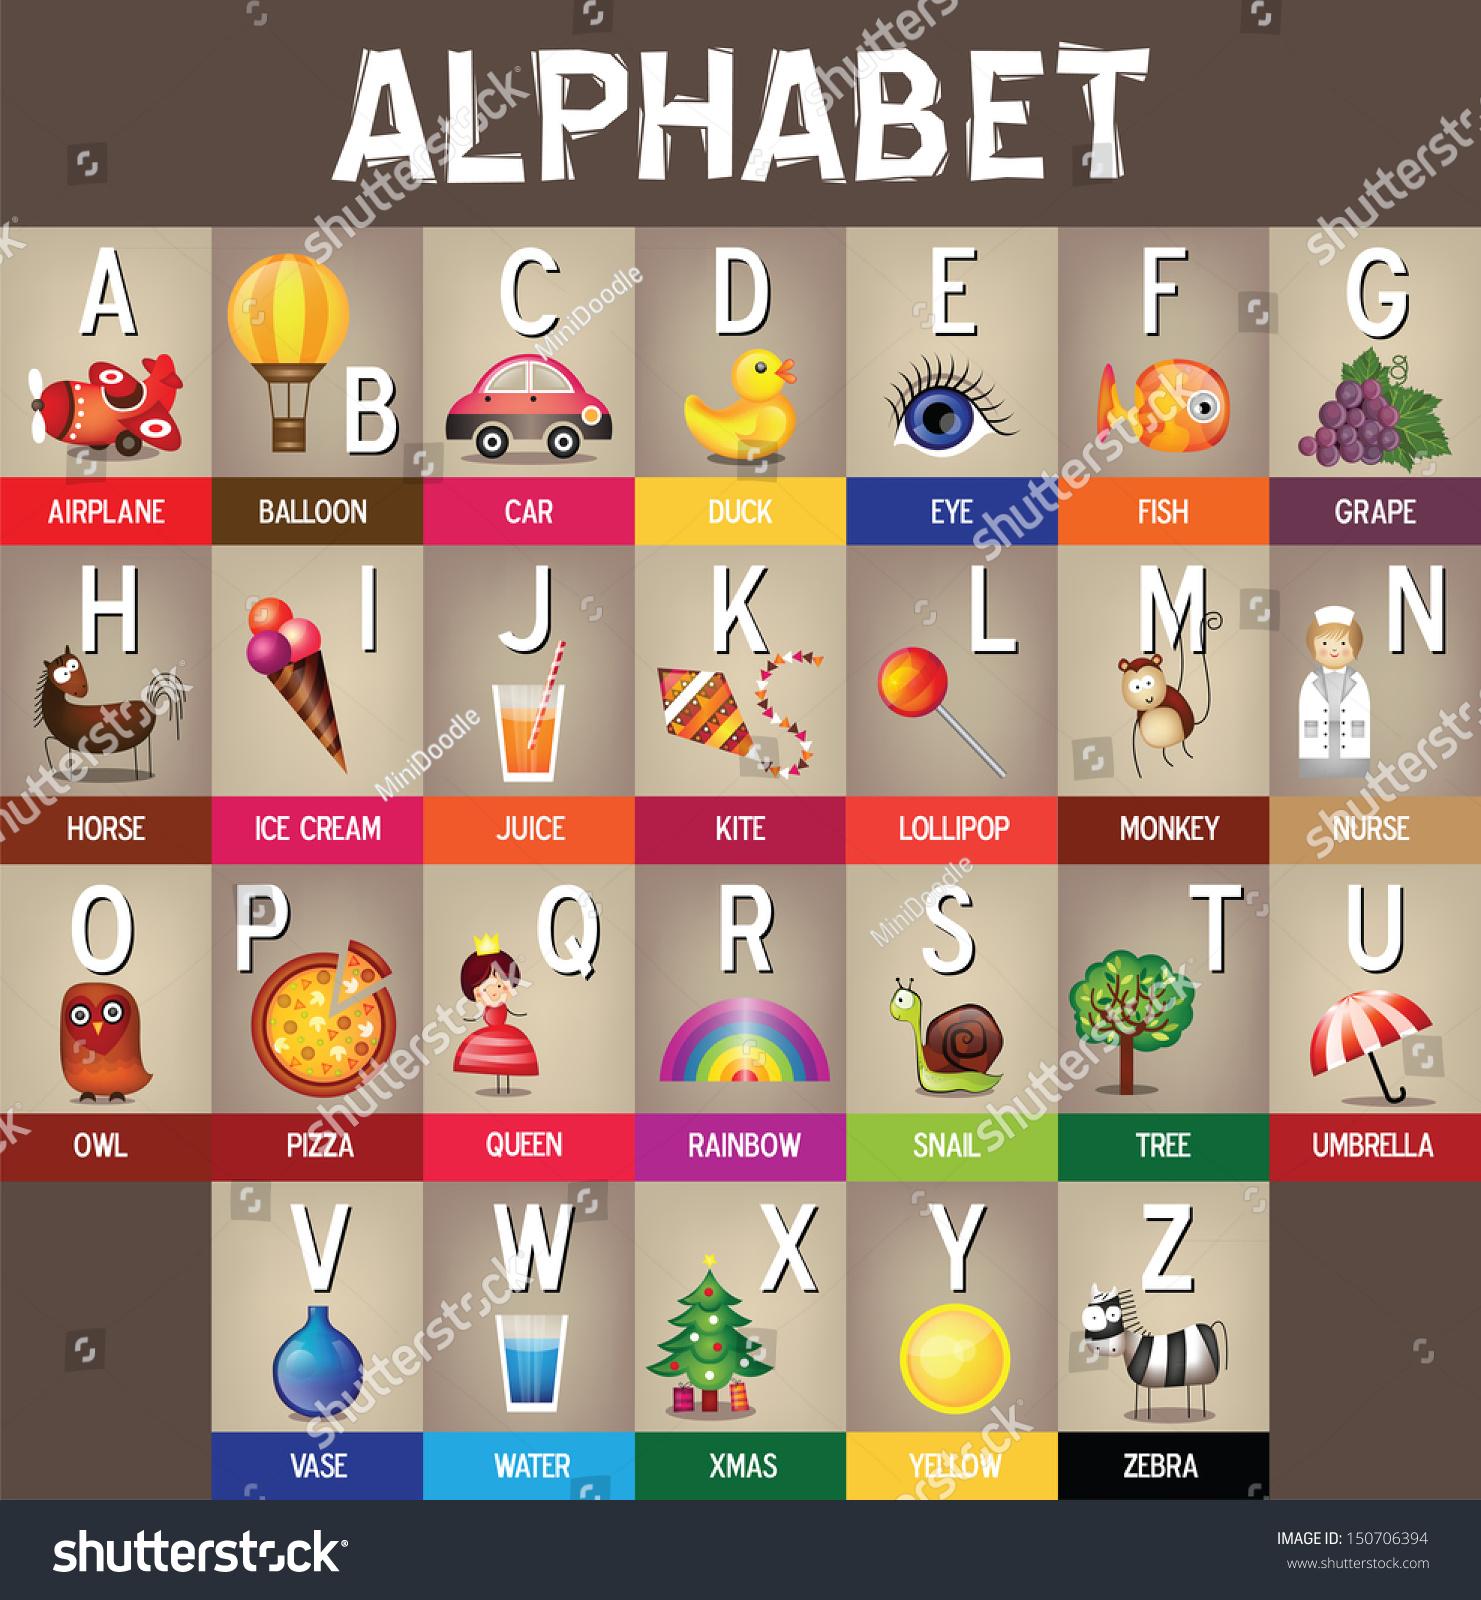 Alphabet Z Pictures Images amp Photos  Photobucket